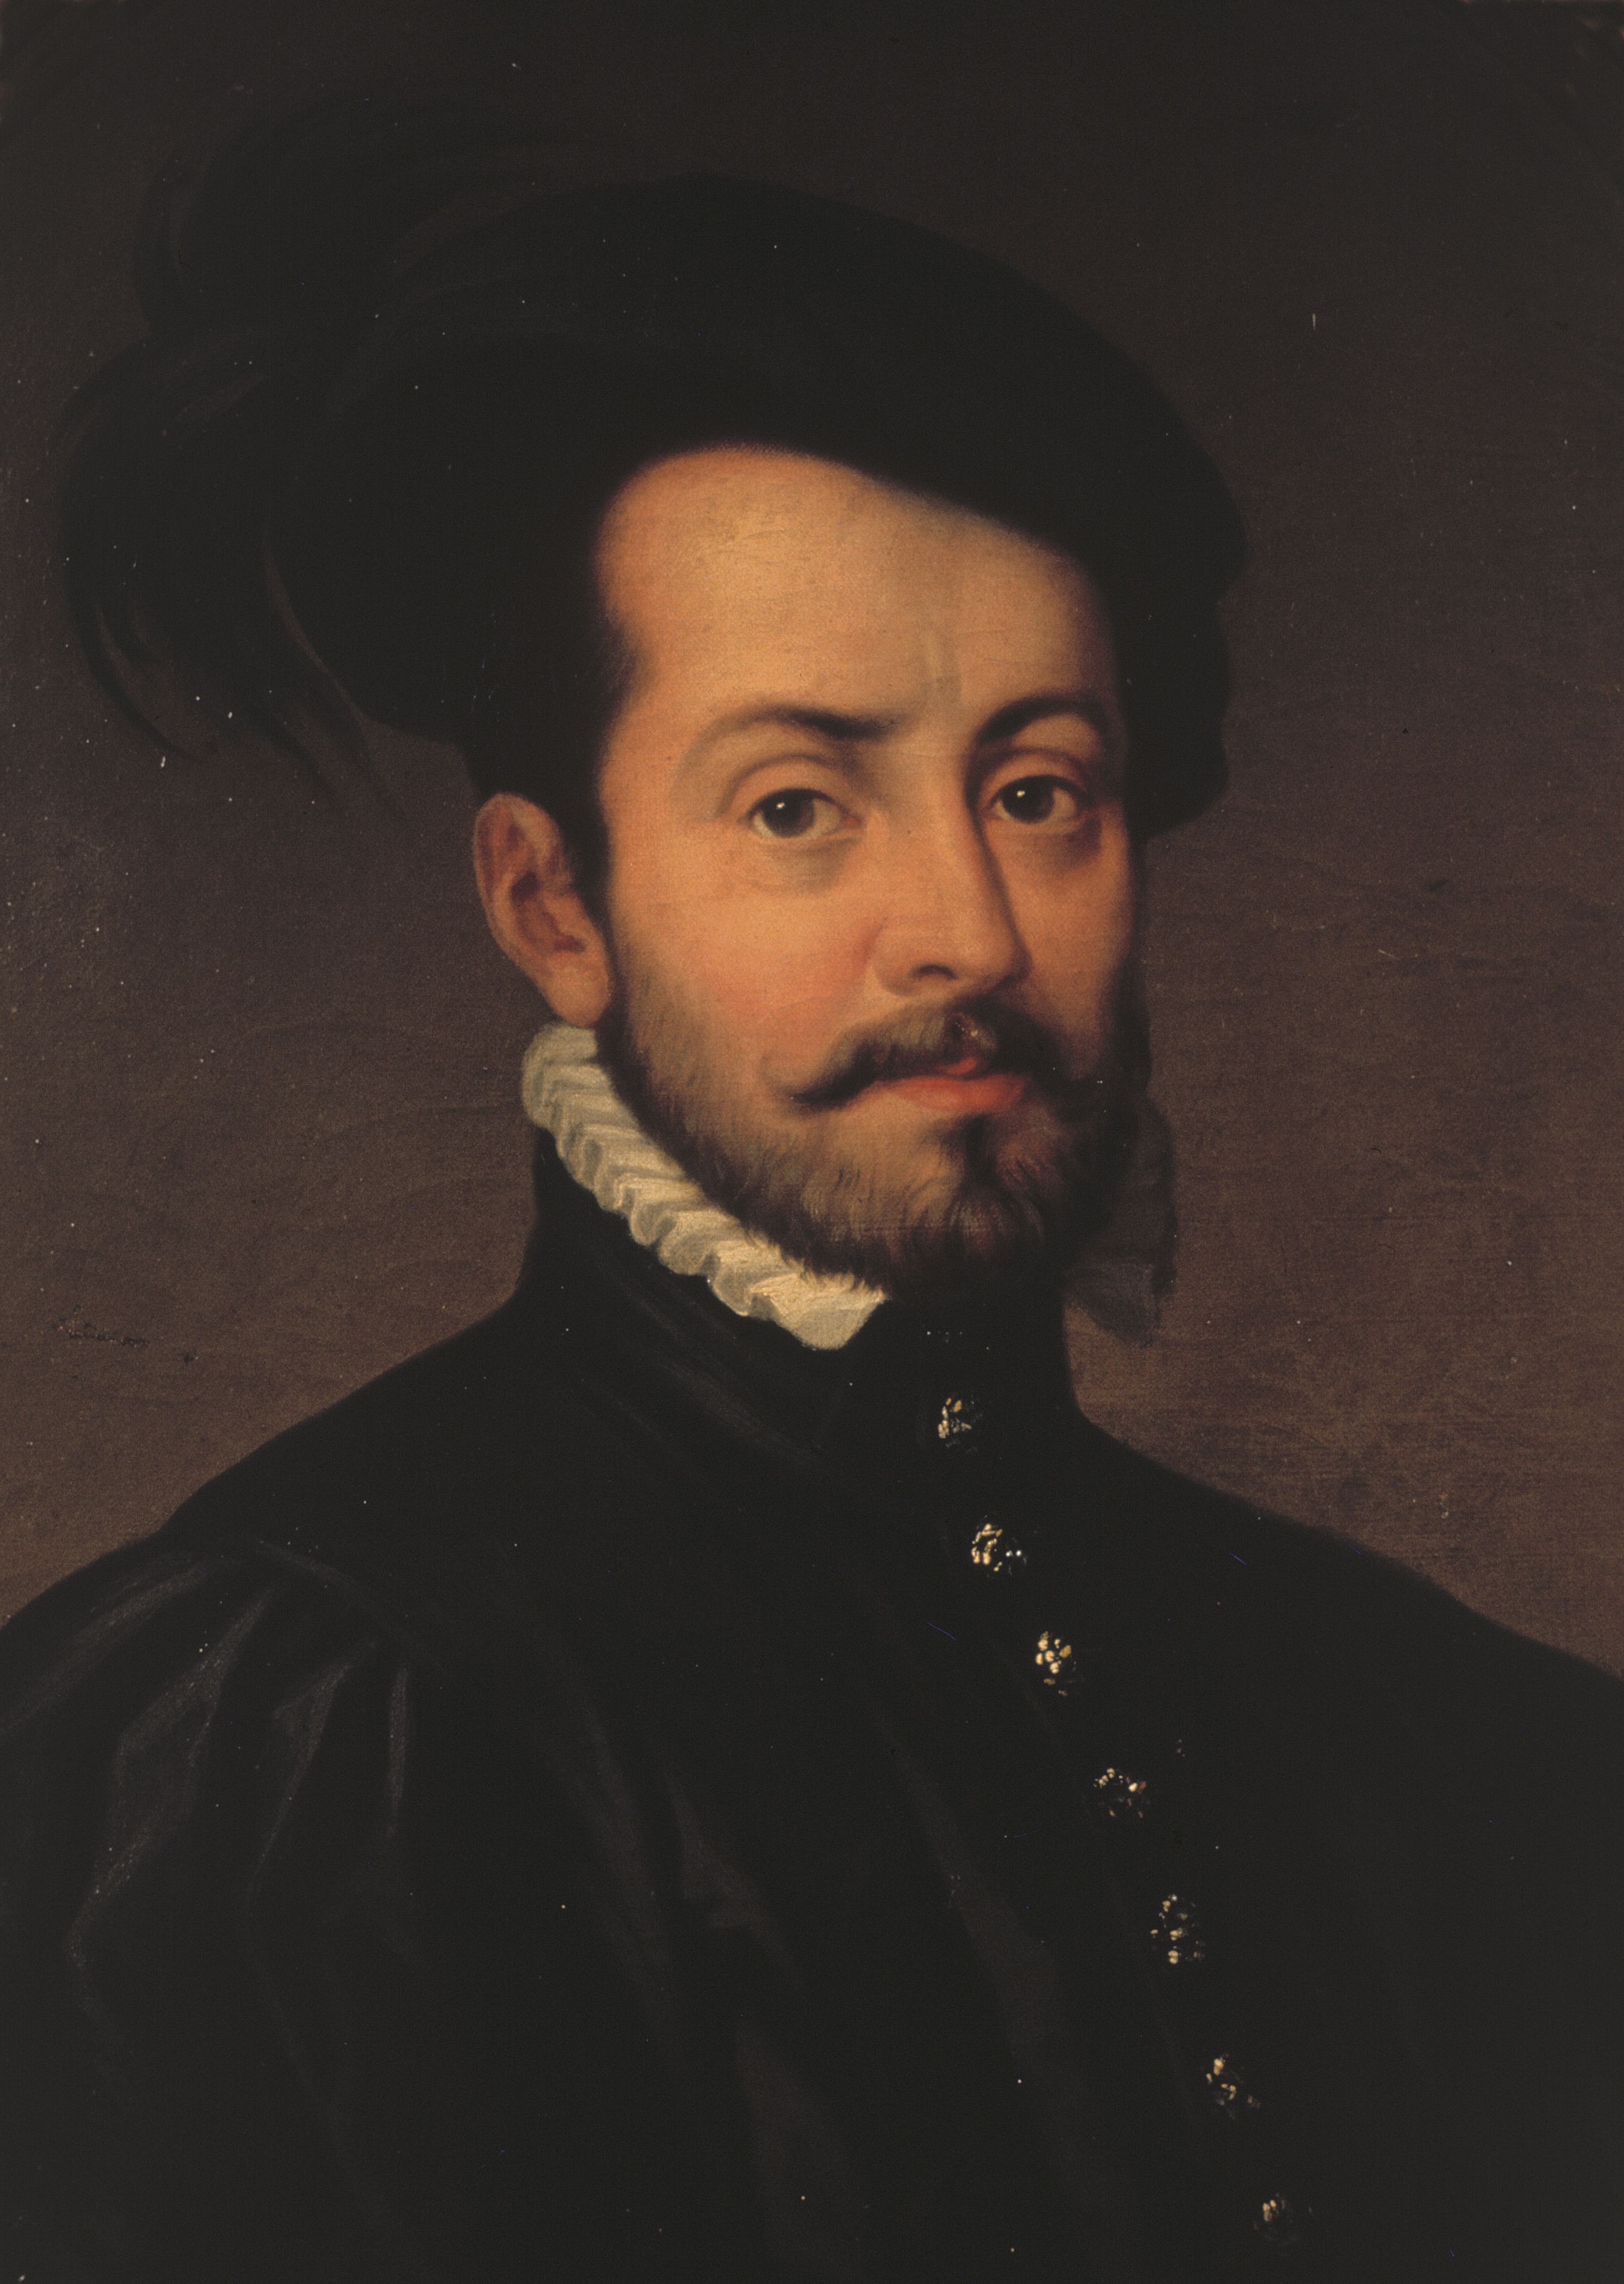 File:Retrato de Hernán Cortés (1485-1547), marqués del ...